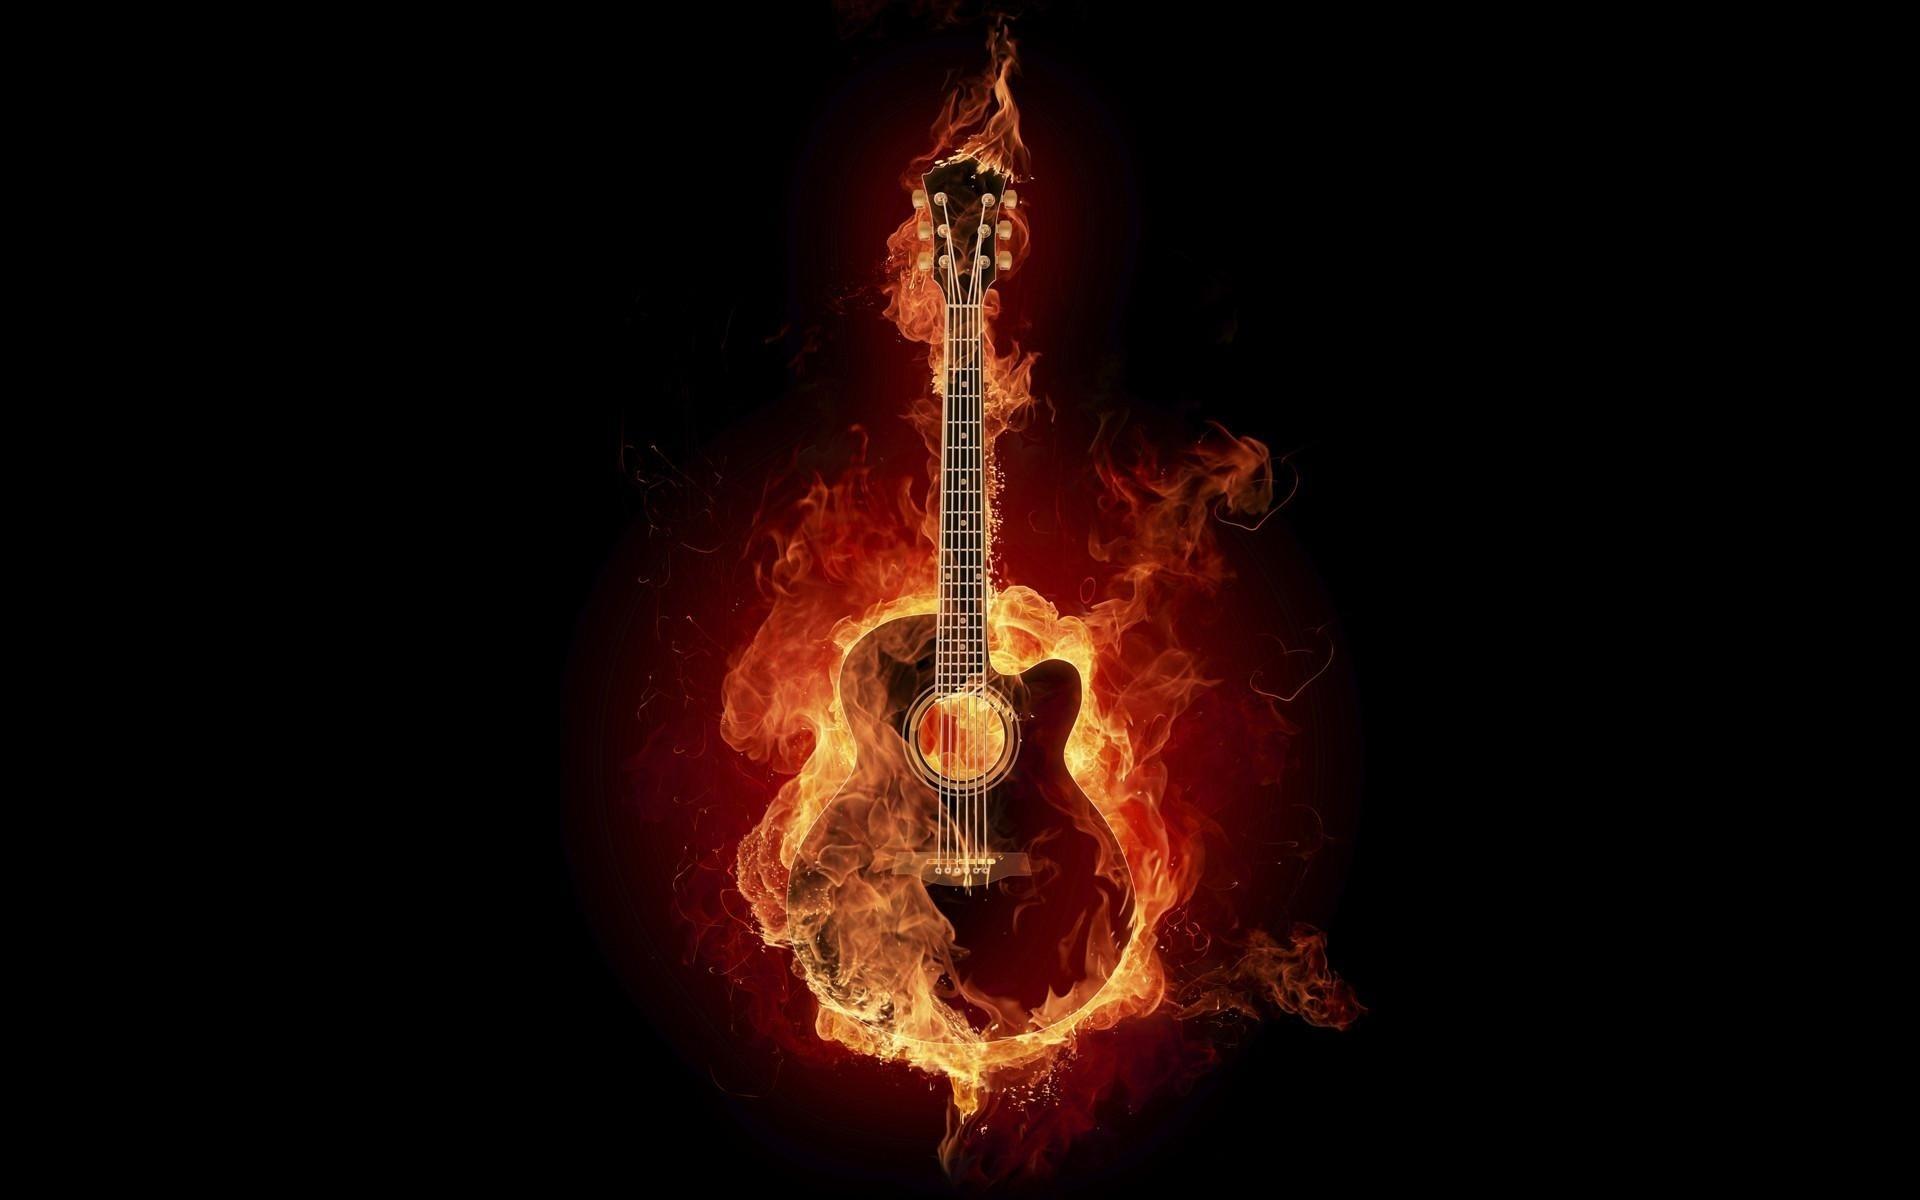 Guitar on Fire | Full HD Desktop Wallpapers 1080p